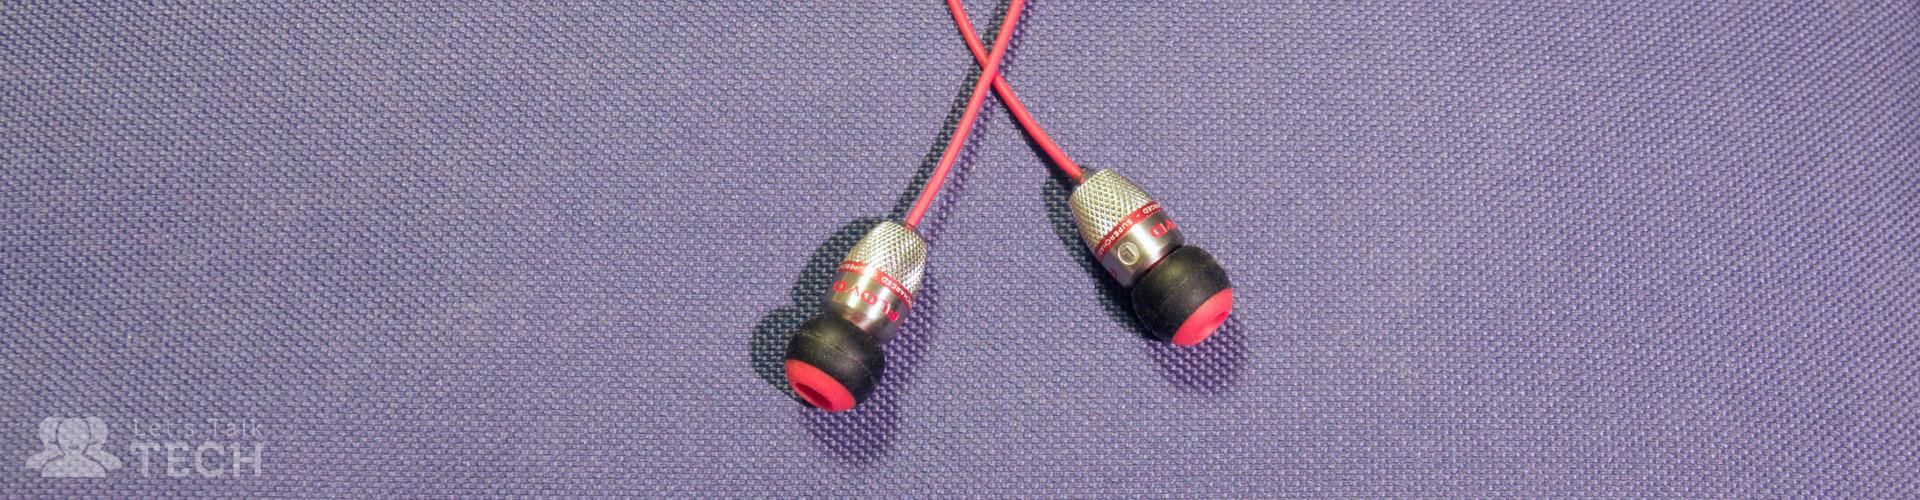 Atomic Floyd Superdarts: Premium Build Quality, Respectable Sound